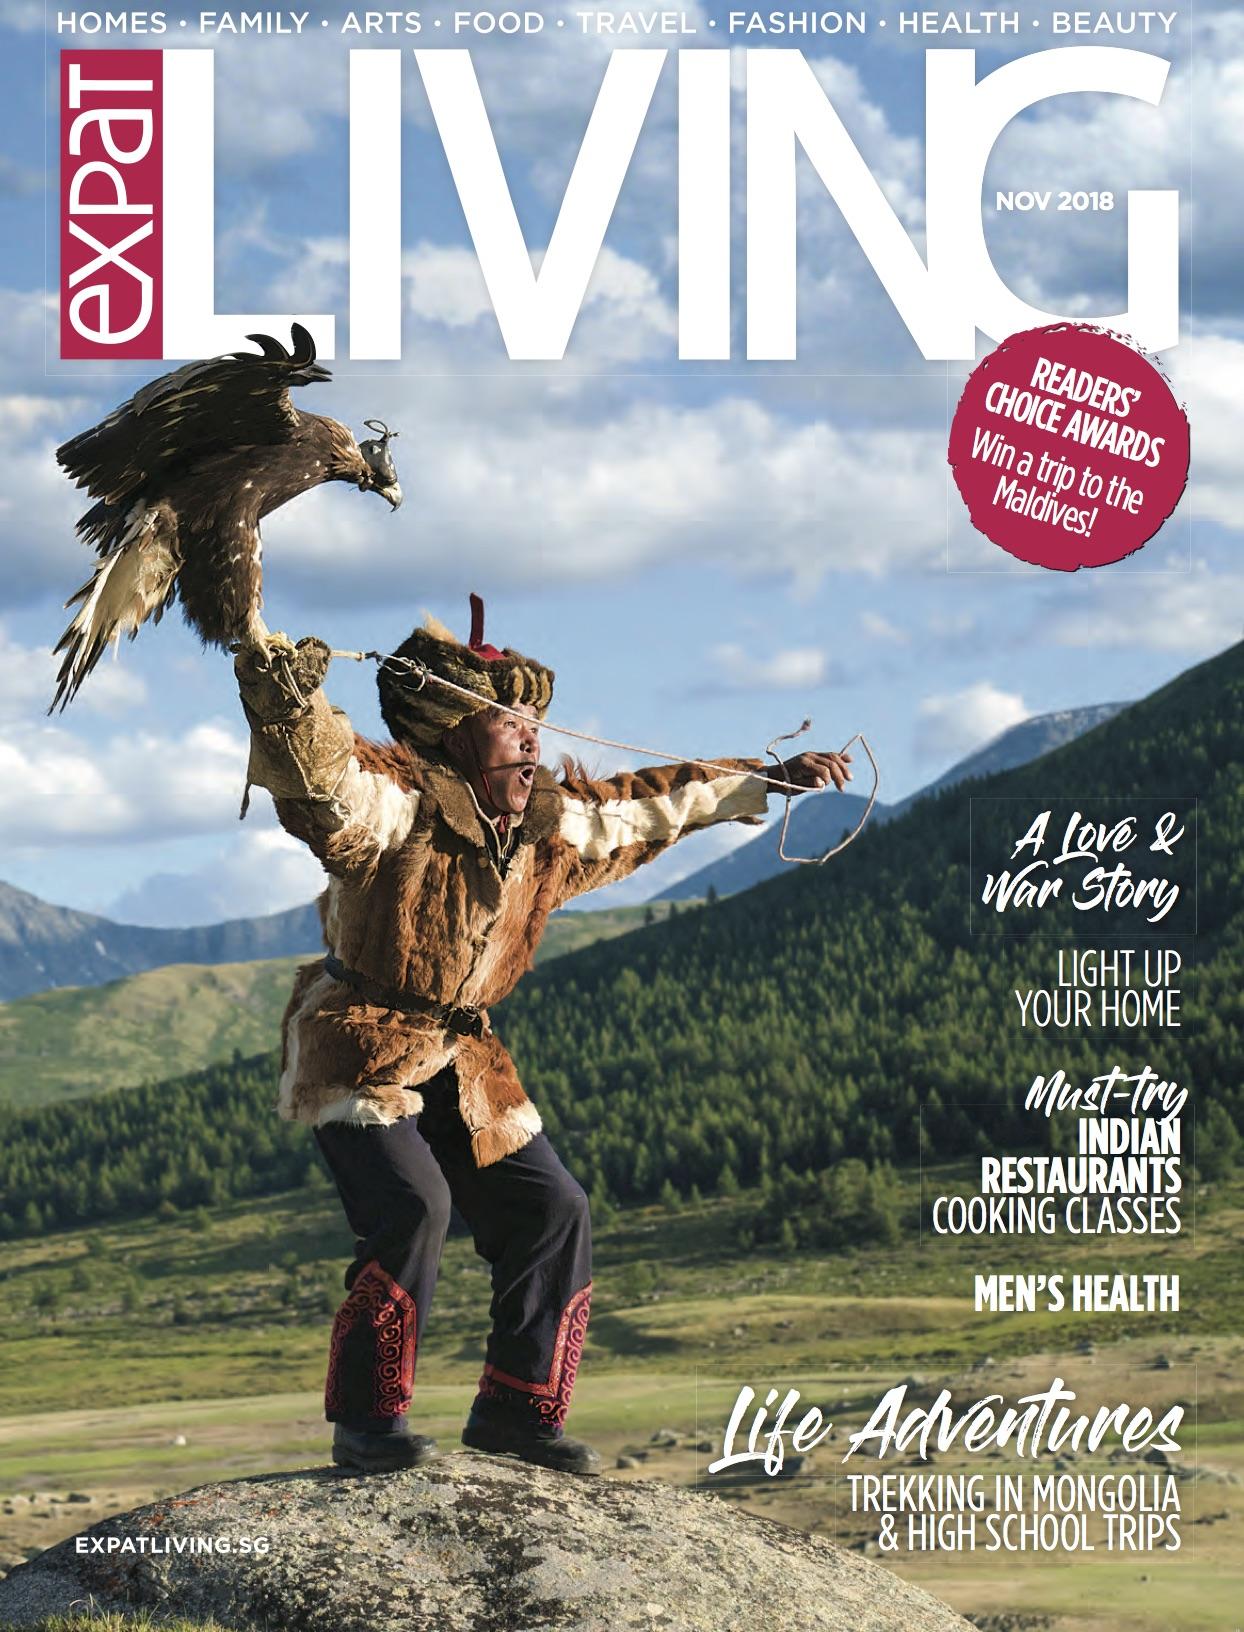 Expat Living Nov 2018 Cover.jpg